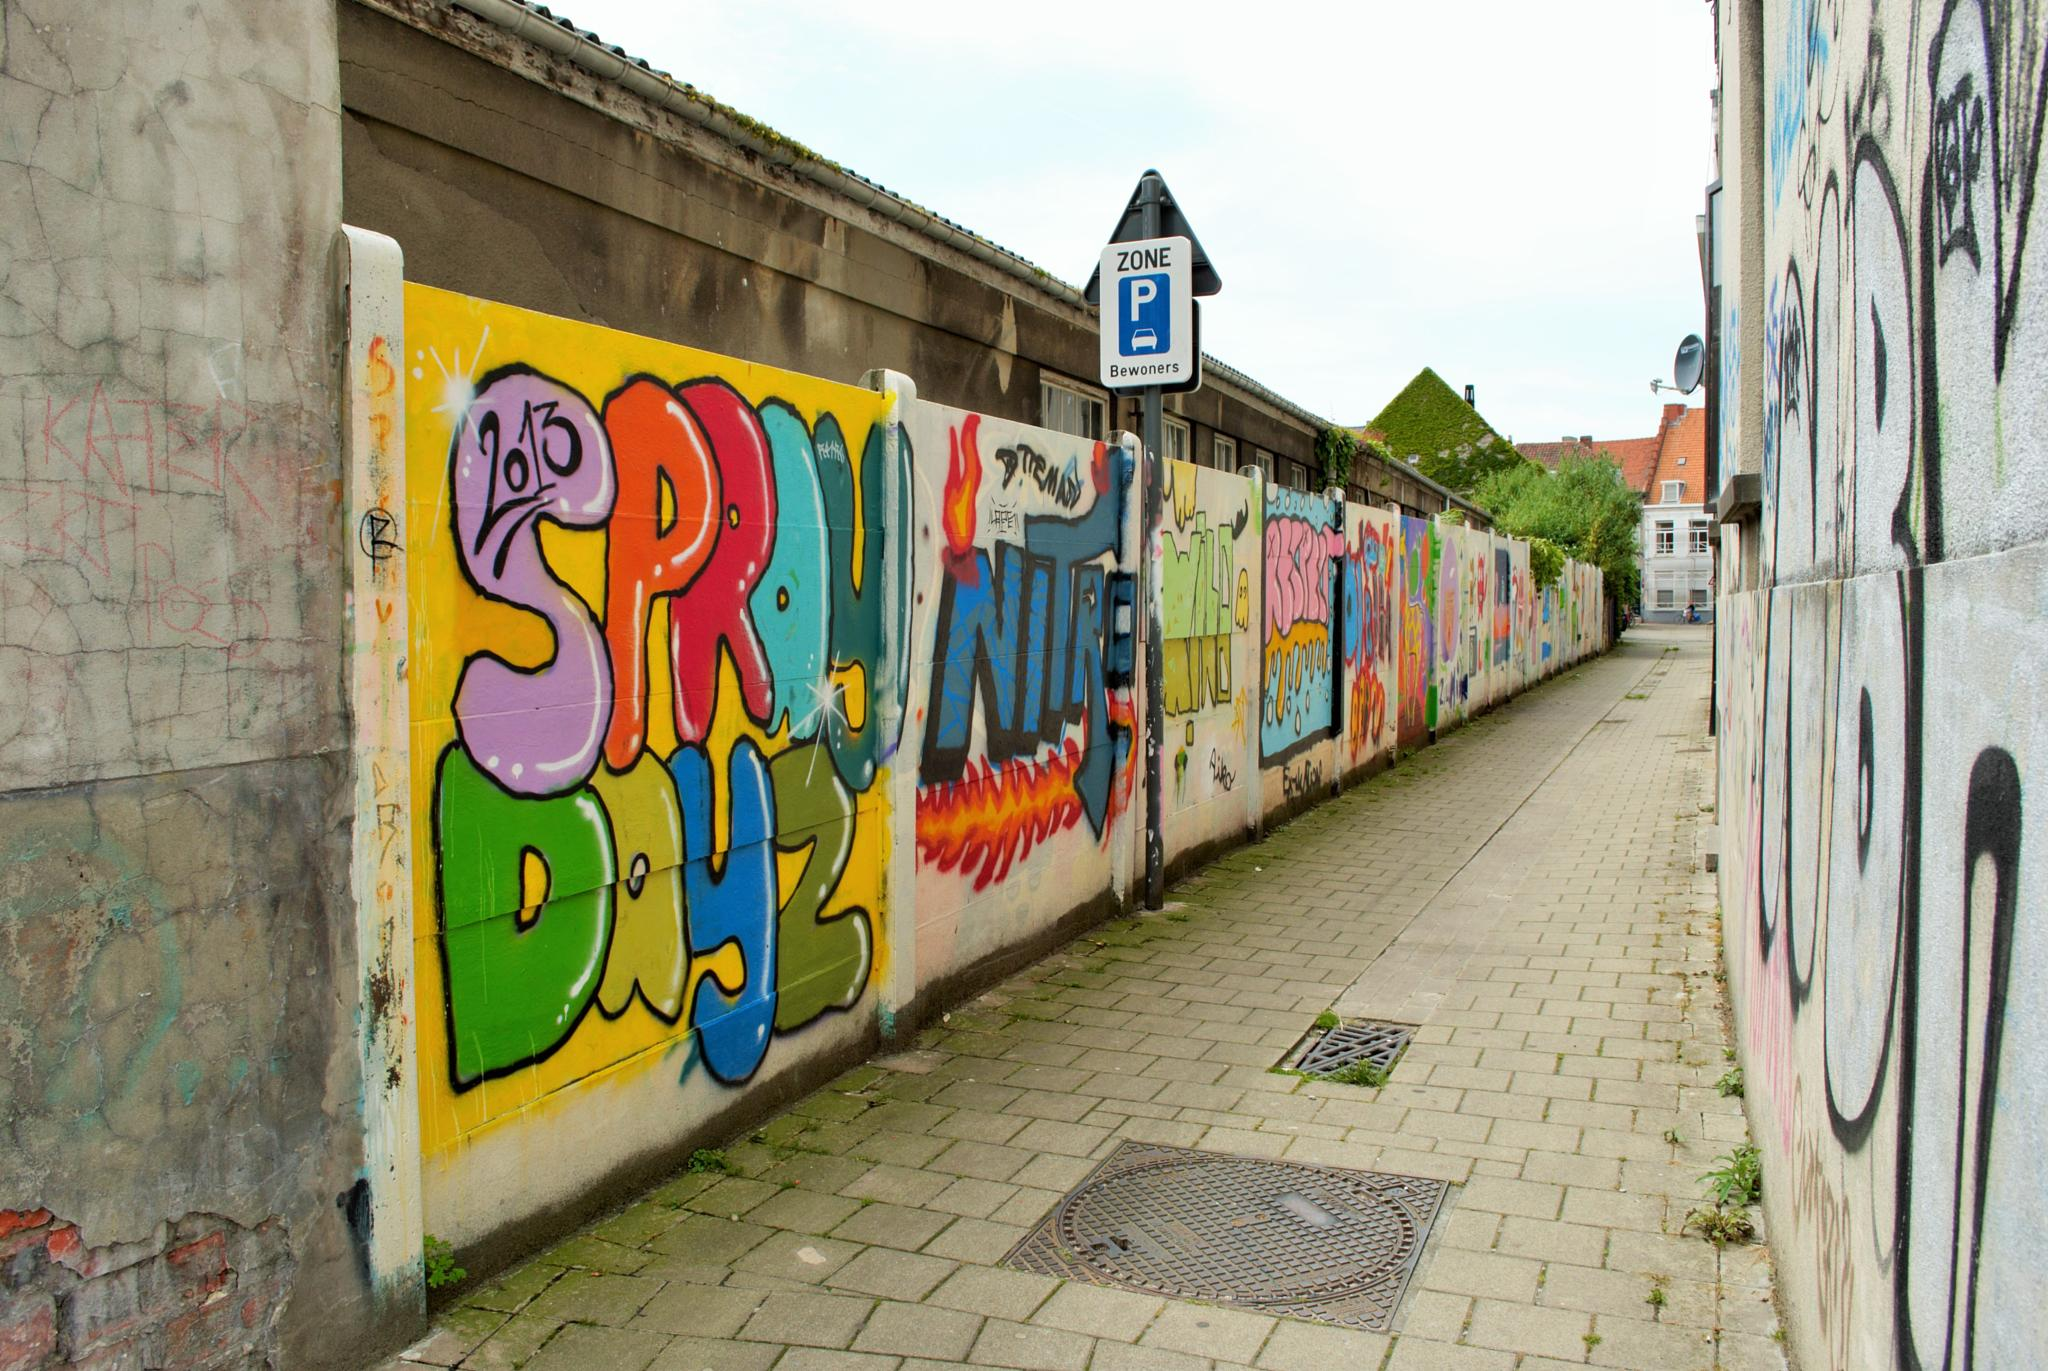 The art of graffiti by KittySchulz